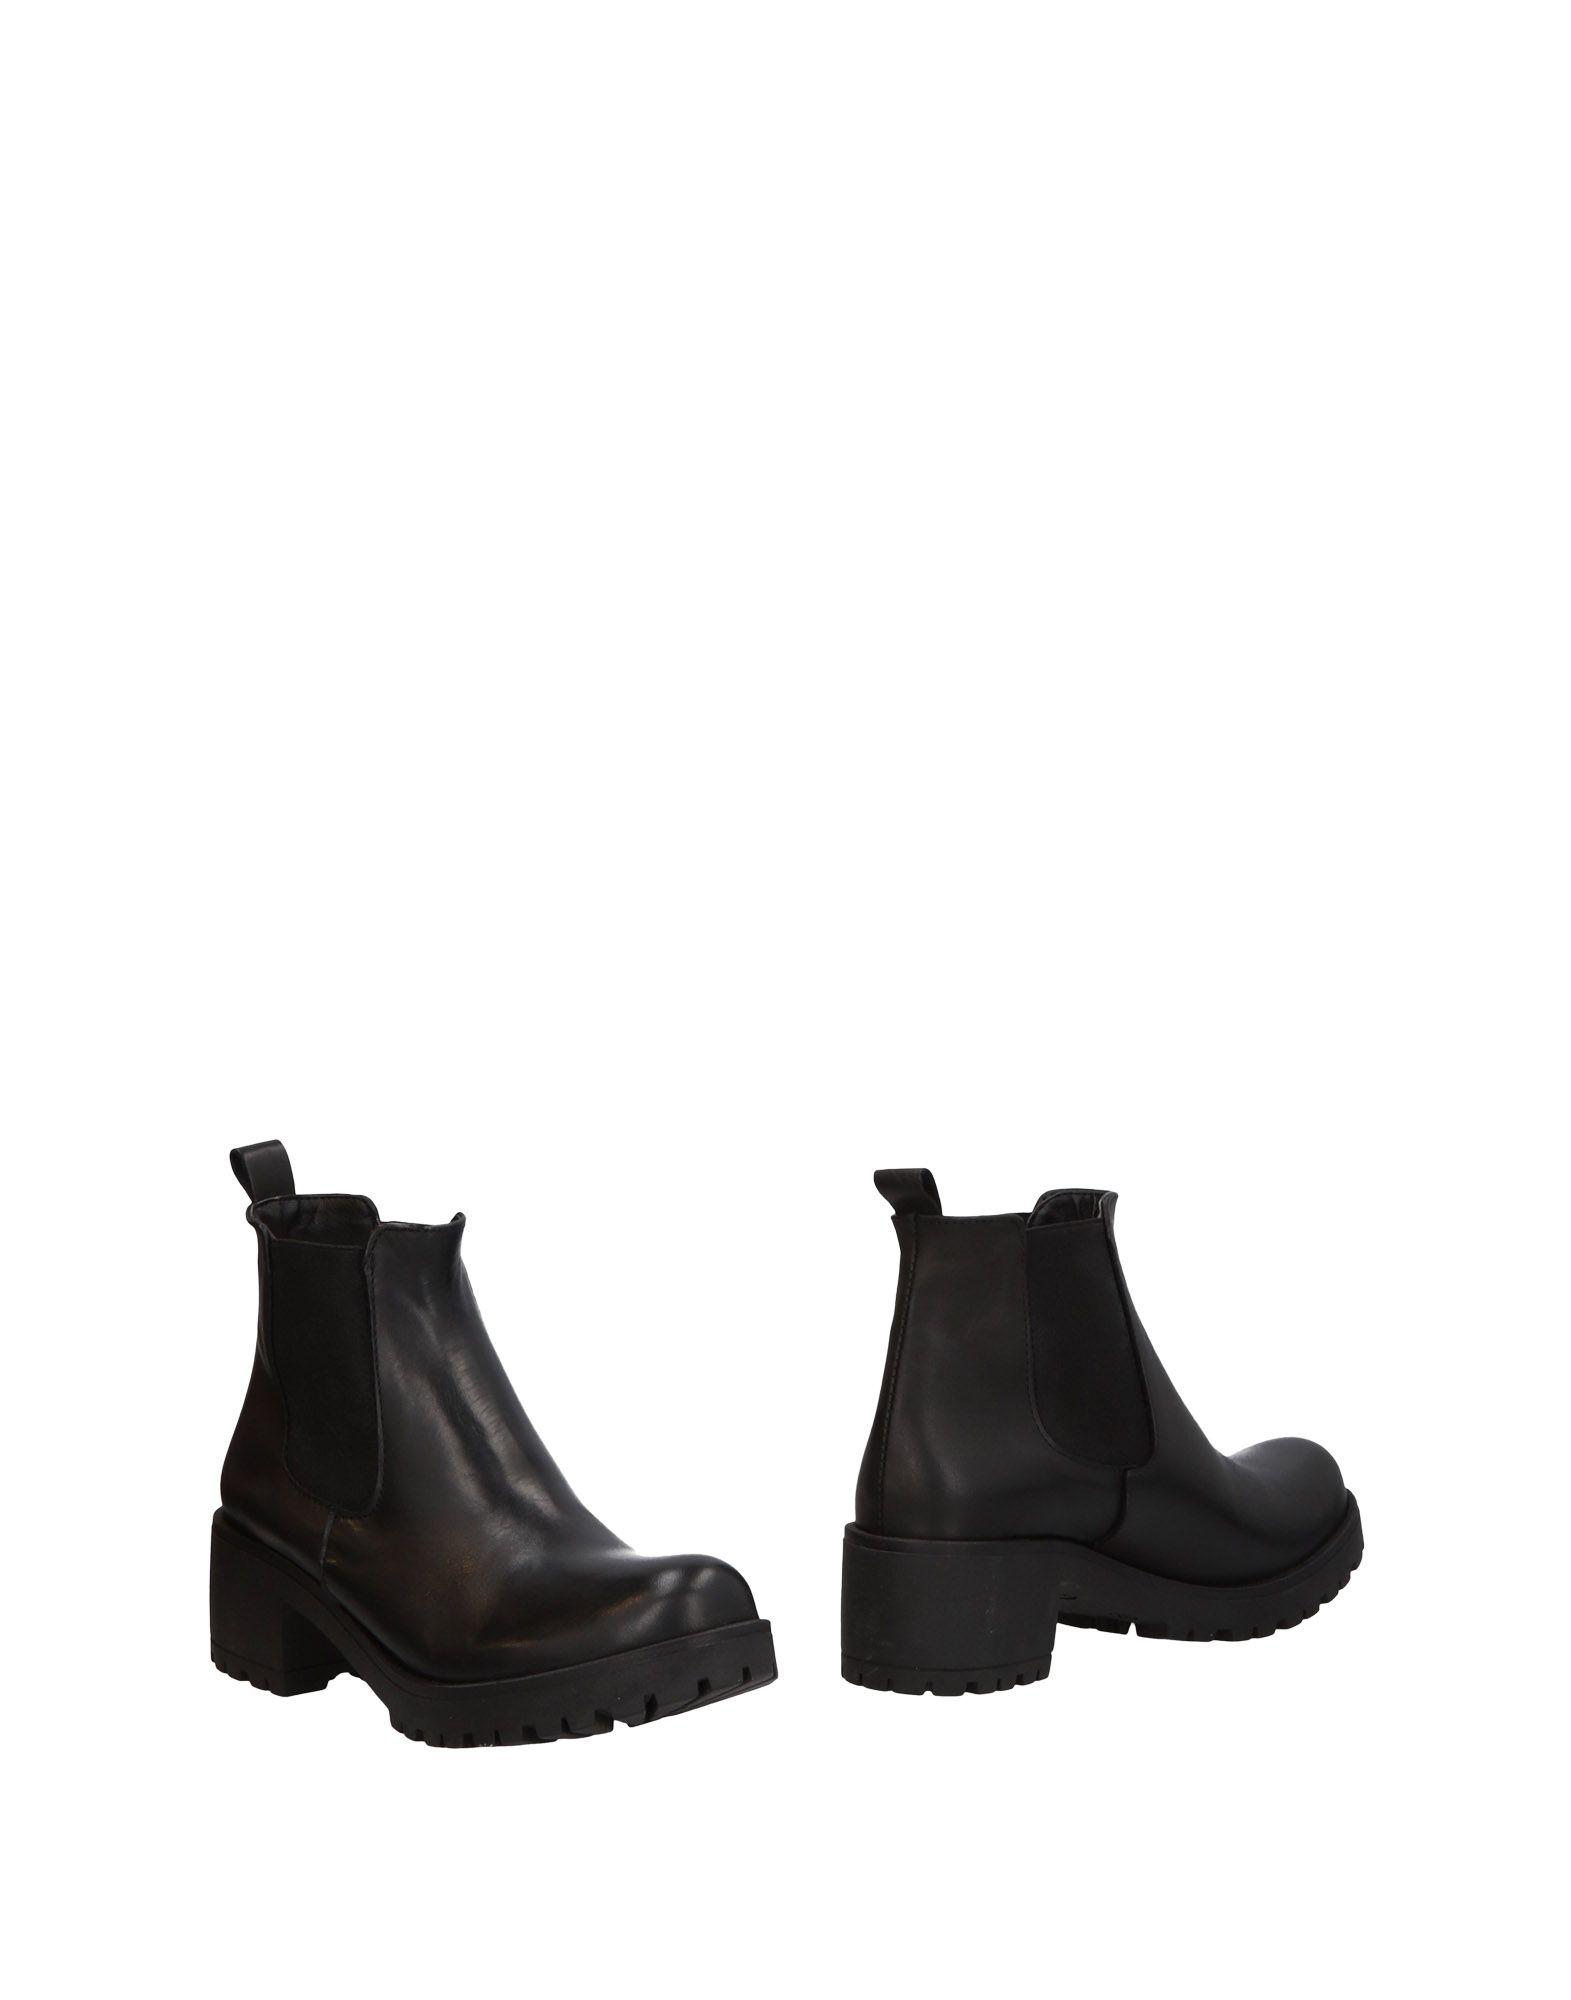 Unlace Chelsea Boots Damen  11471317SM Gute Qualität beliebte Schuhe